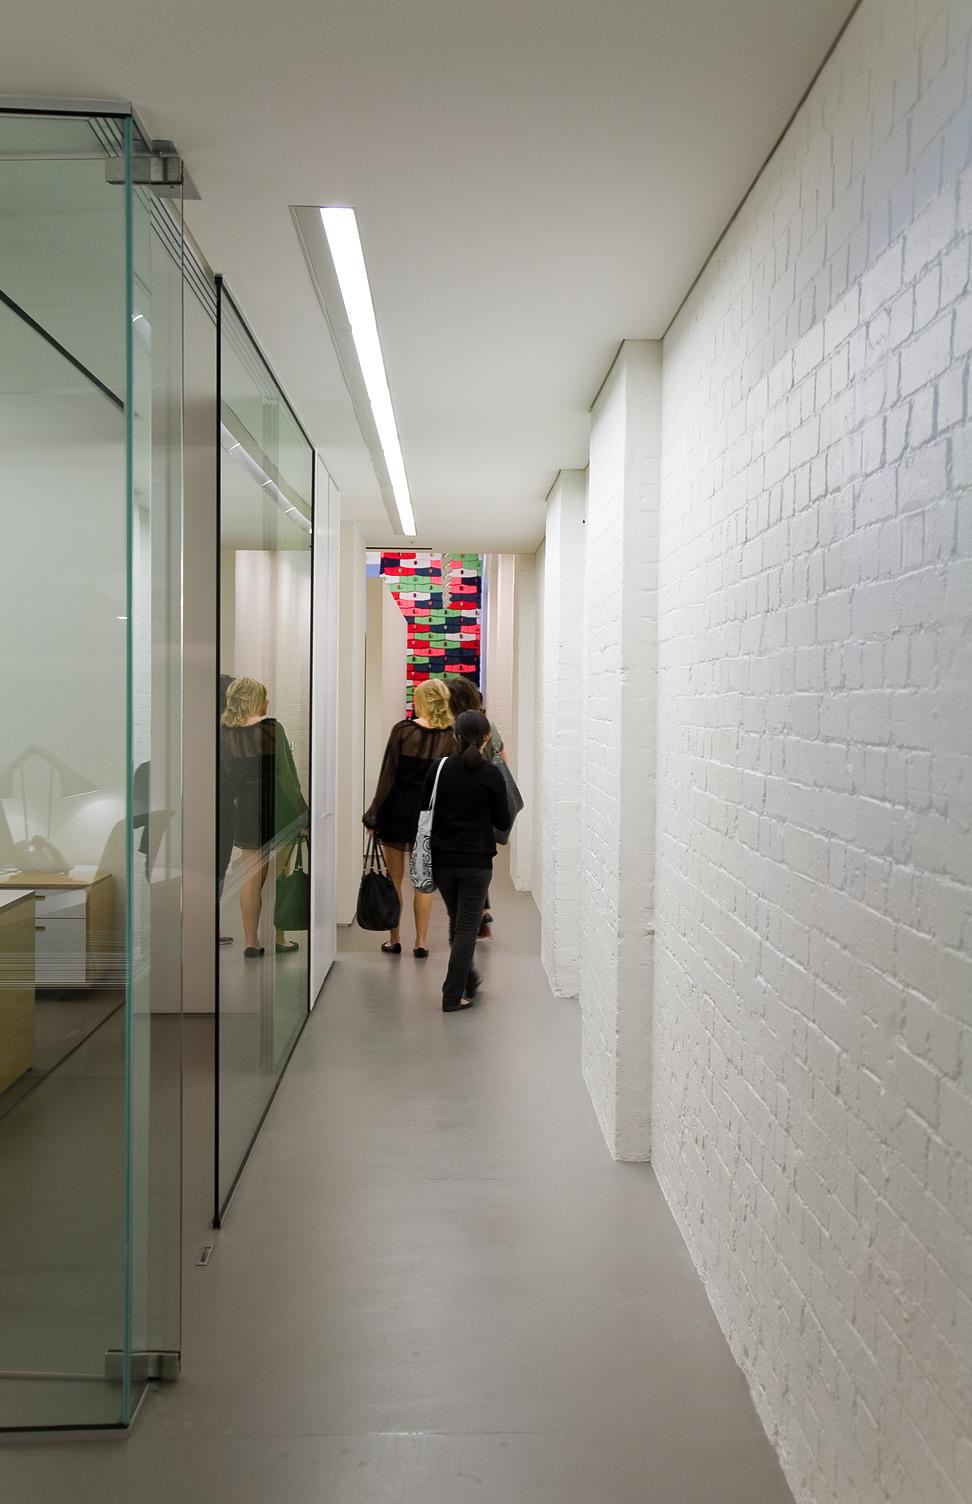 04 Corridor